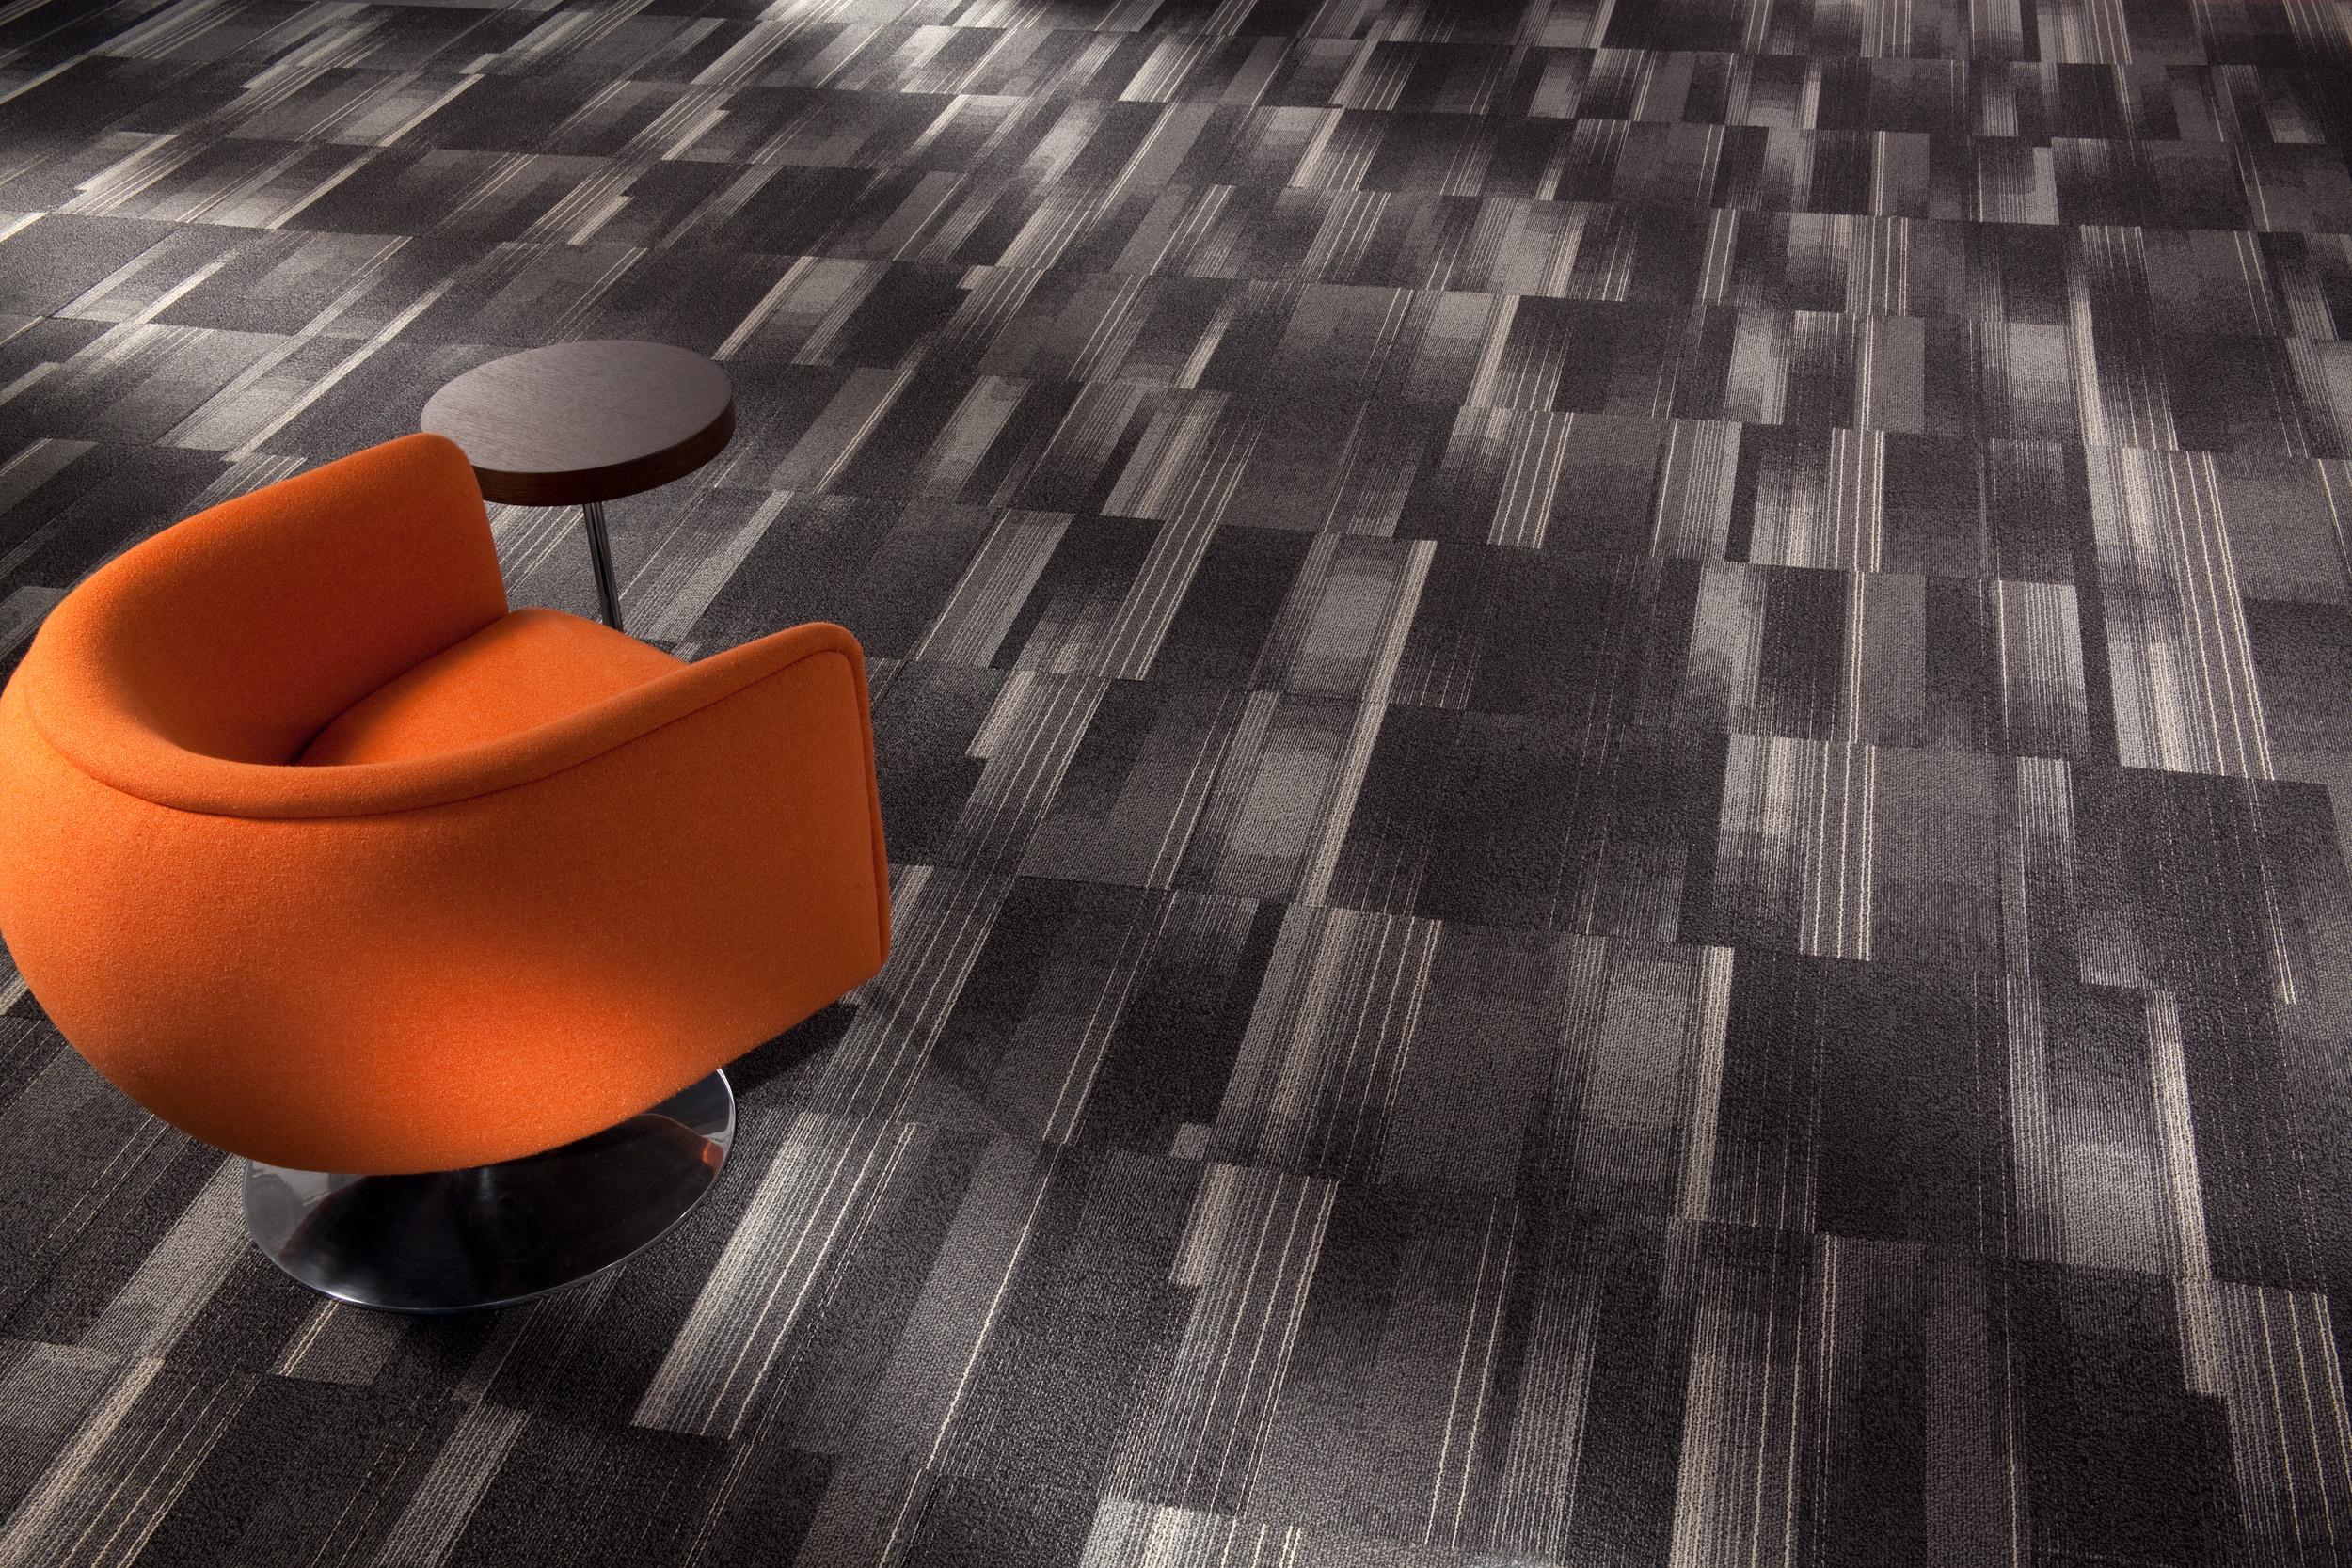 Panoramic_Black-Monolithic-OrangeChair_WoodTable.jpg